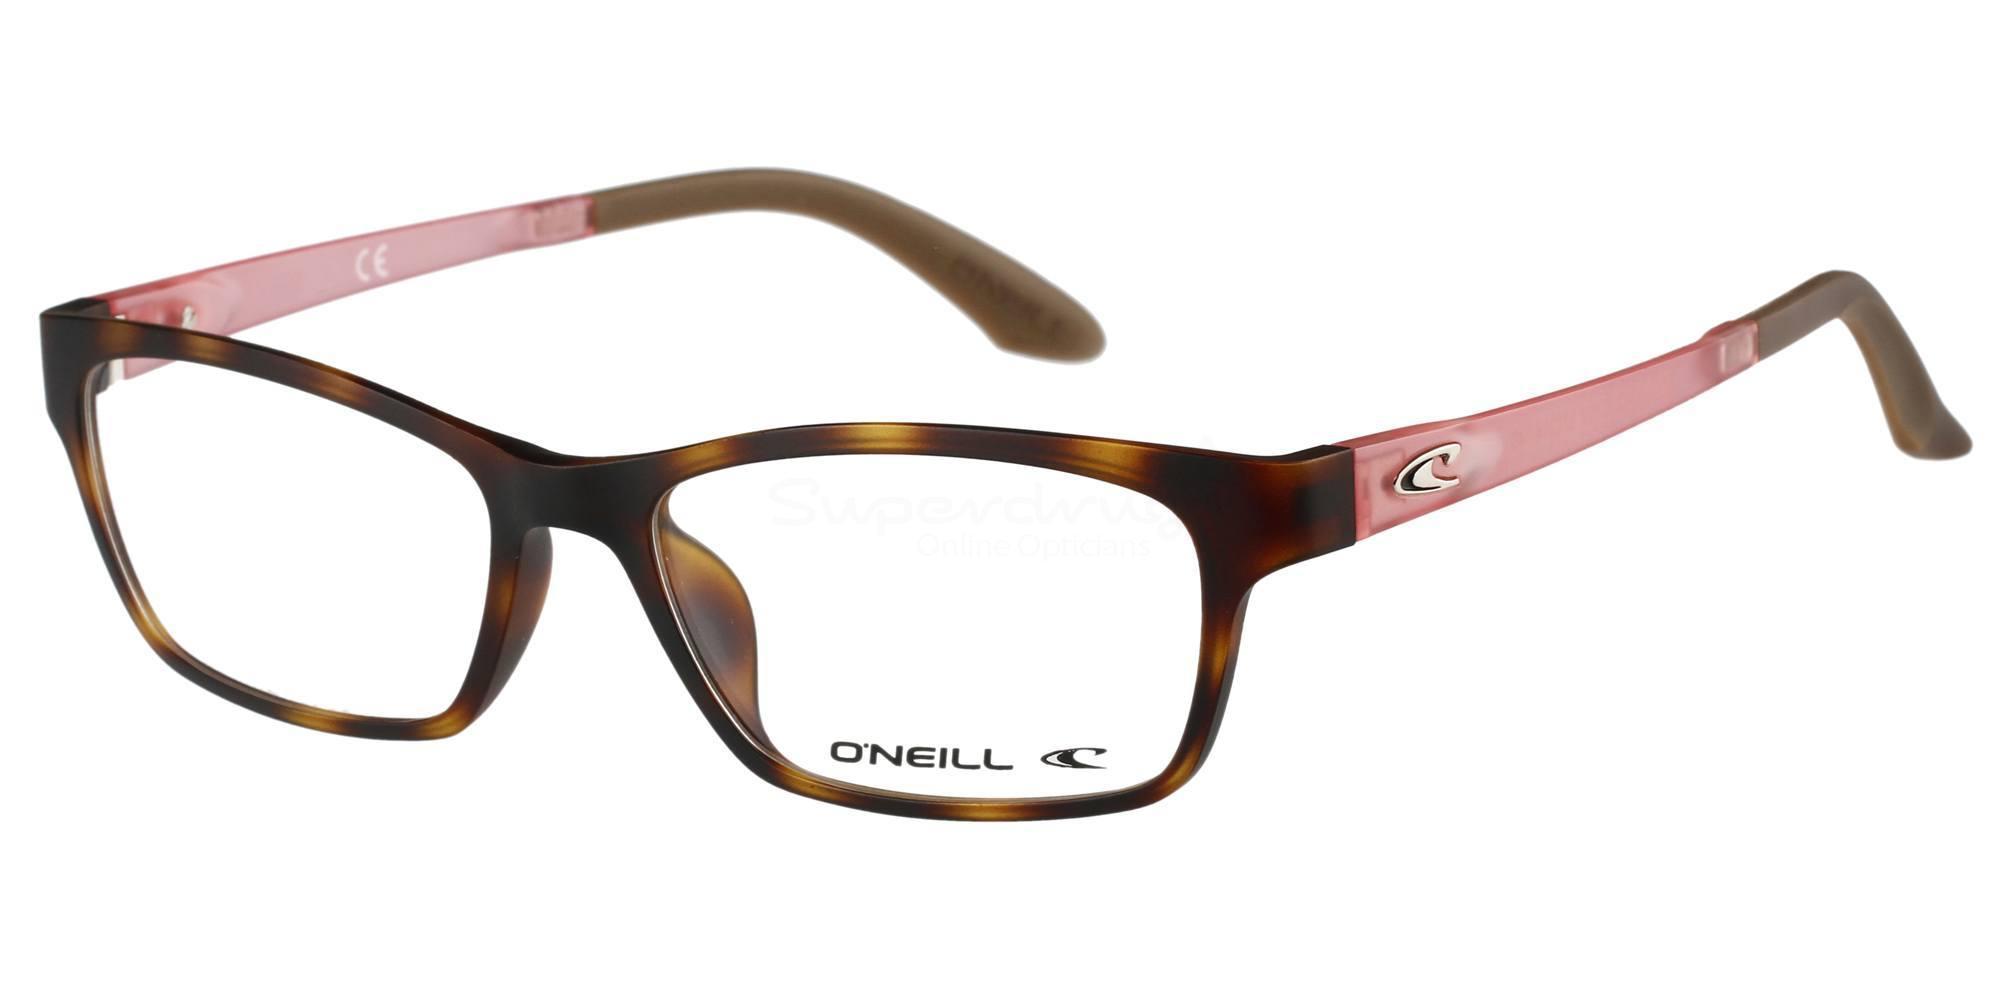 102 ONO-JUNO , O'Neill